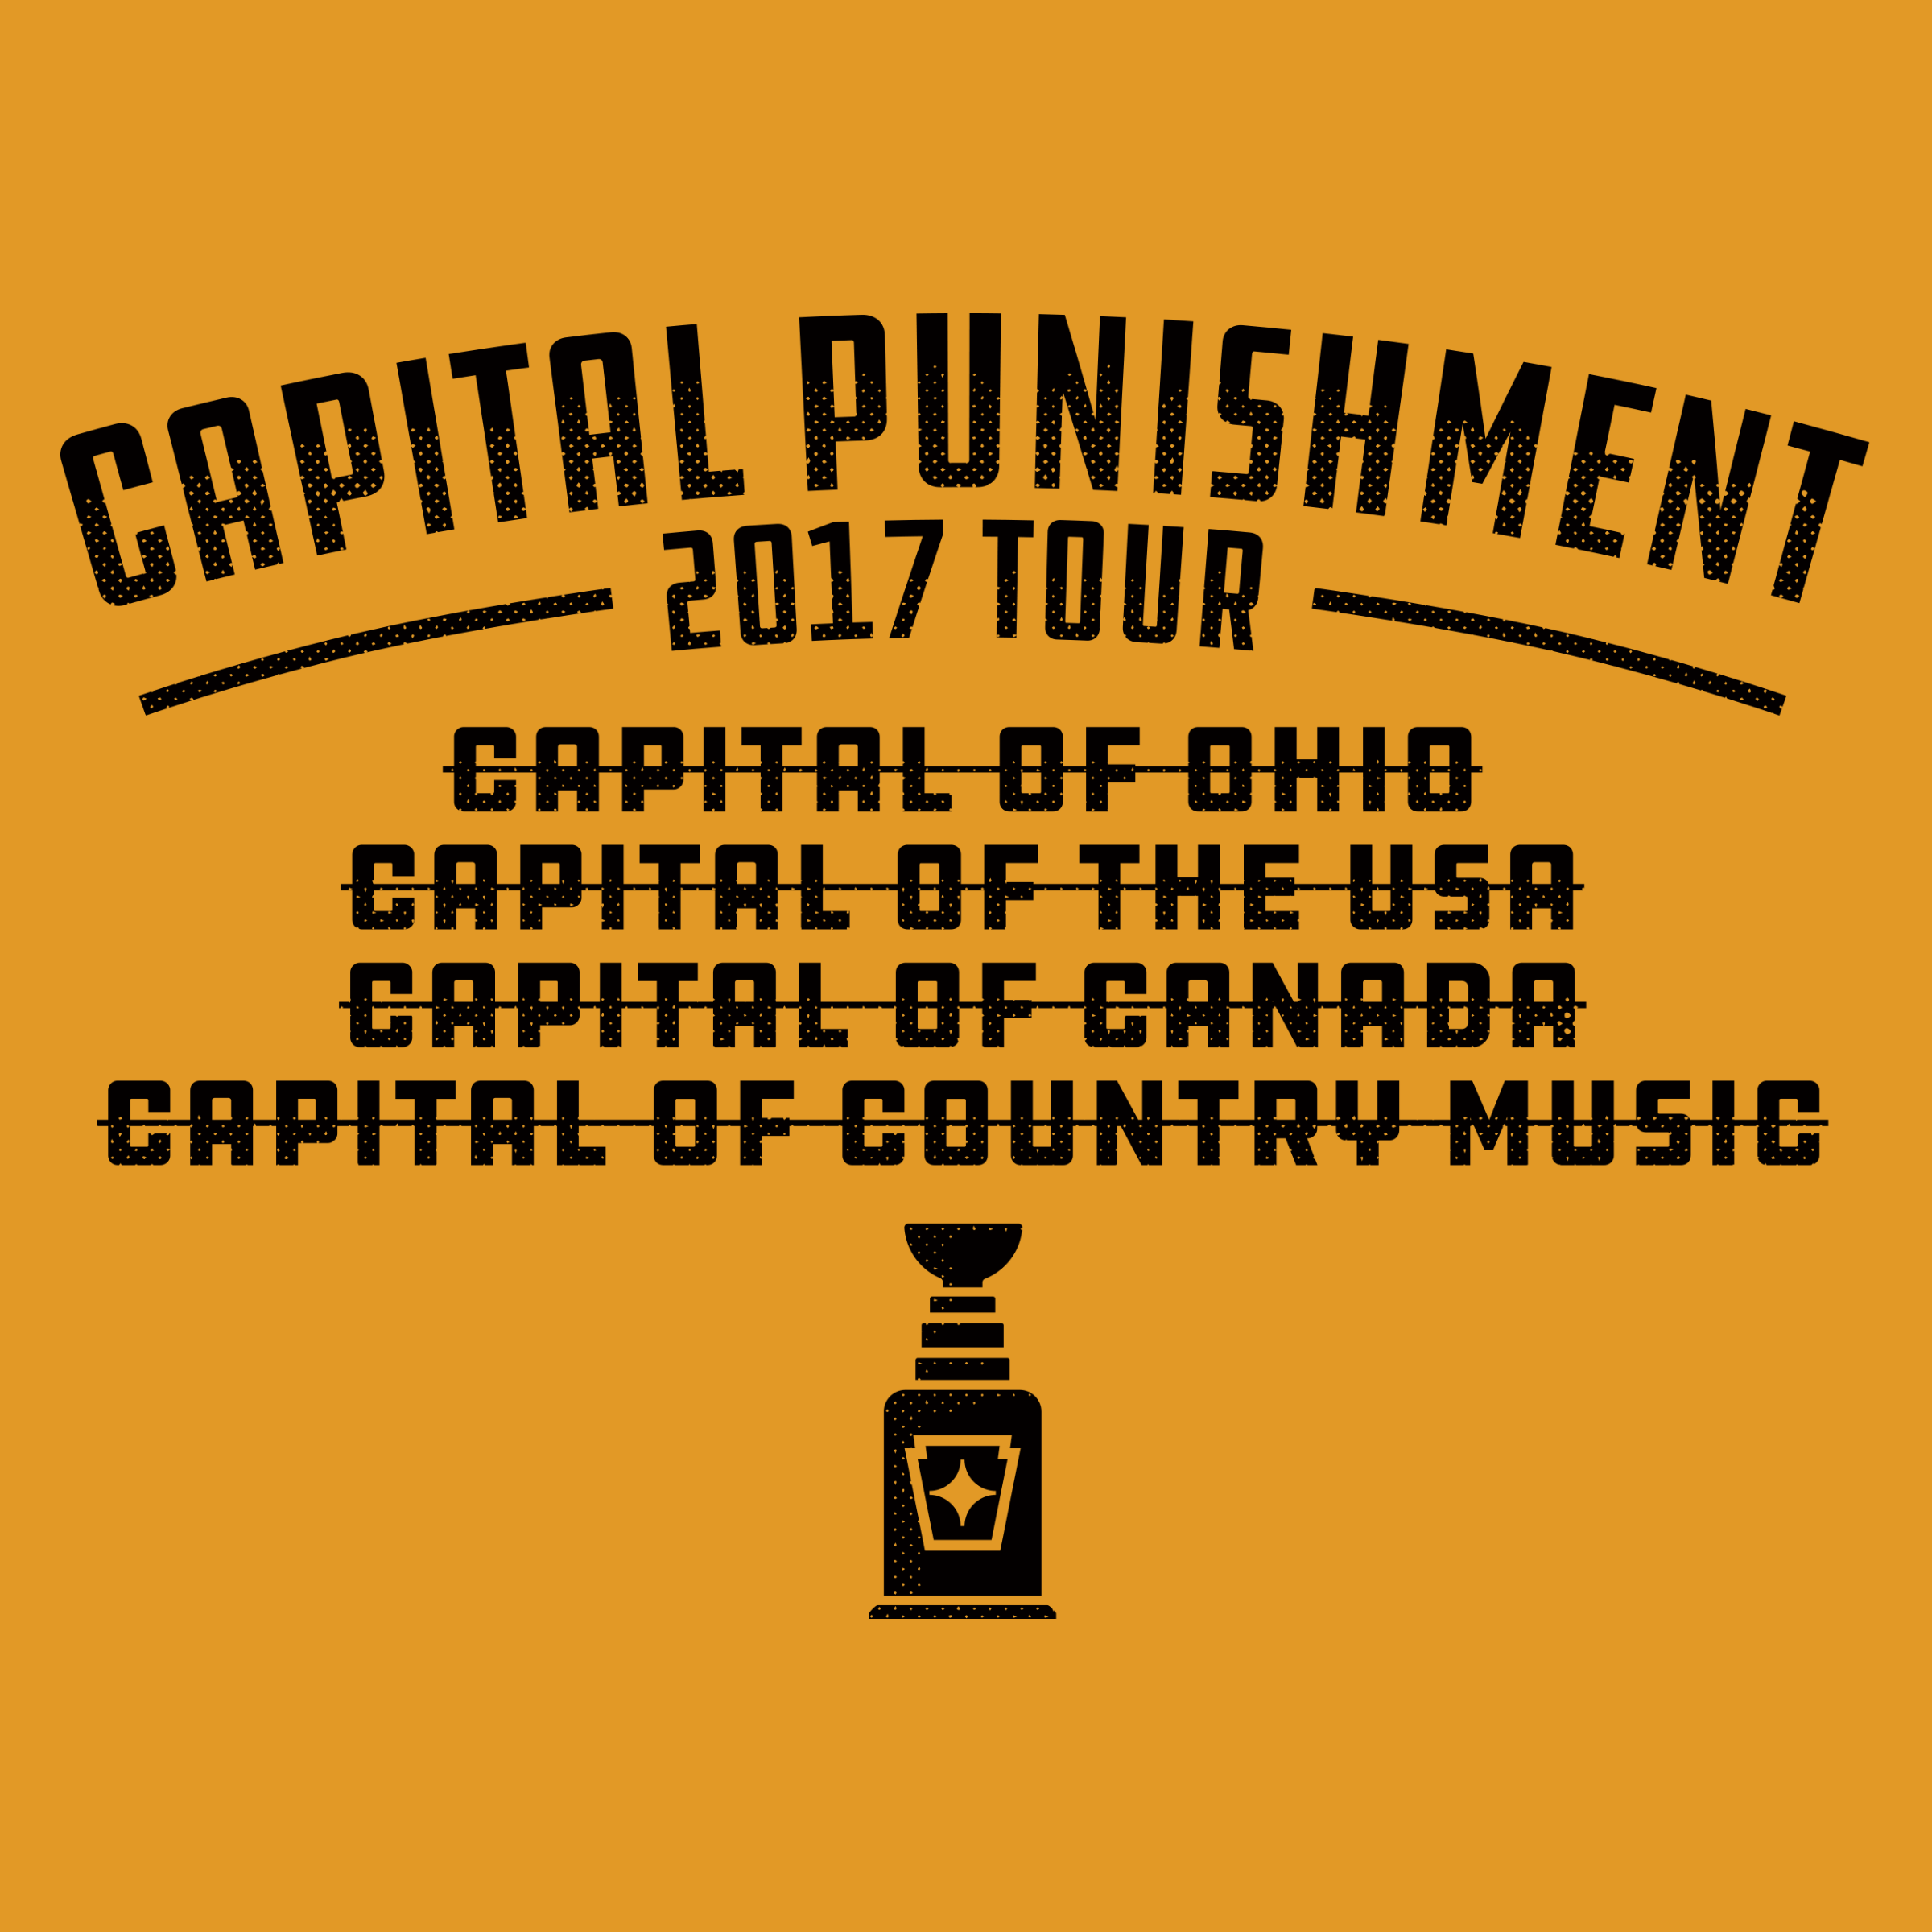 Capital Punishment: 2017 Tour